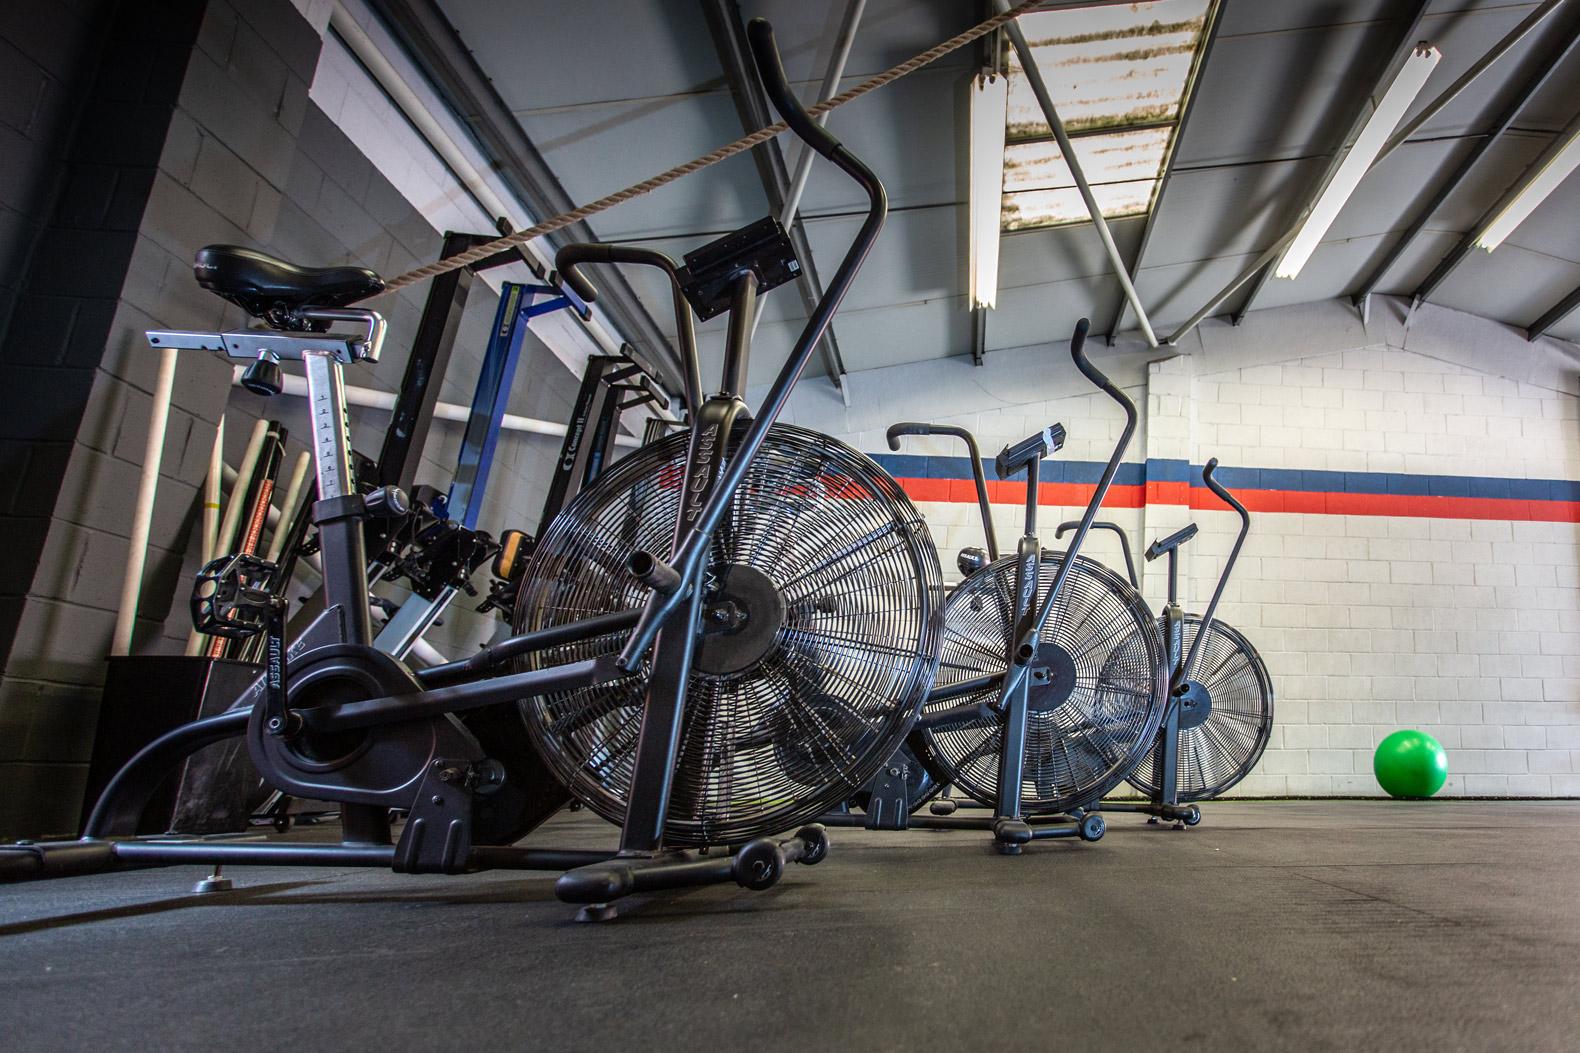 Air-bike.jpg